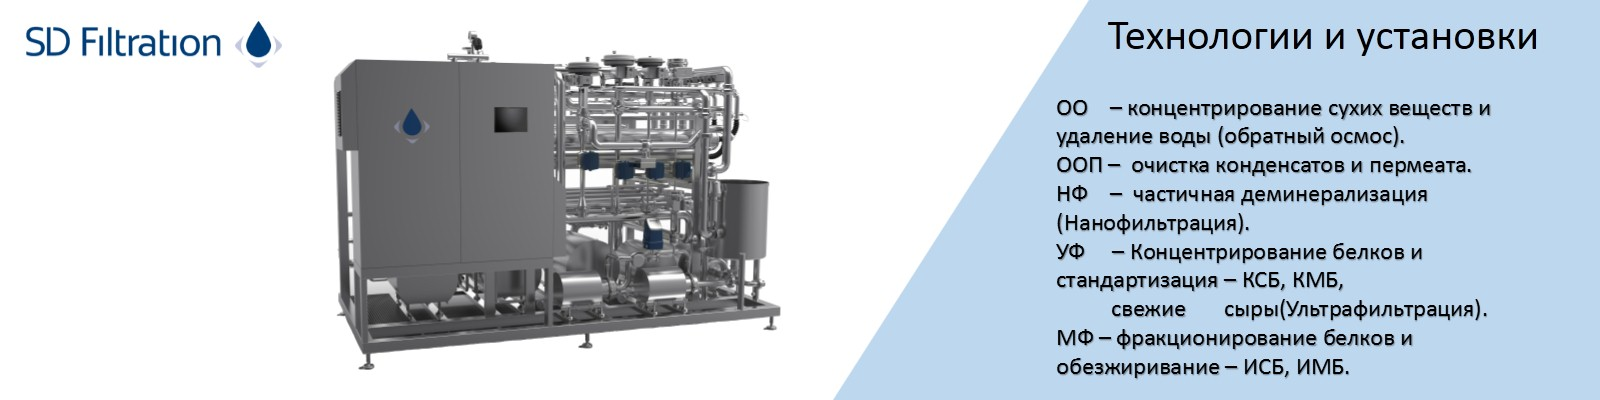 sd filtration